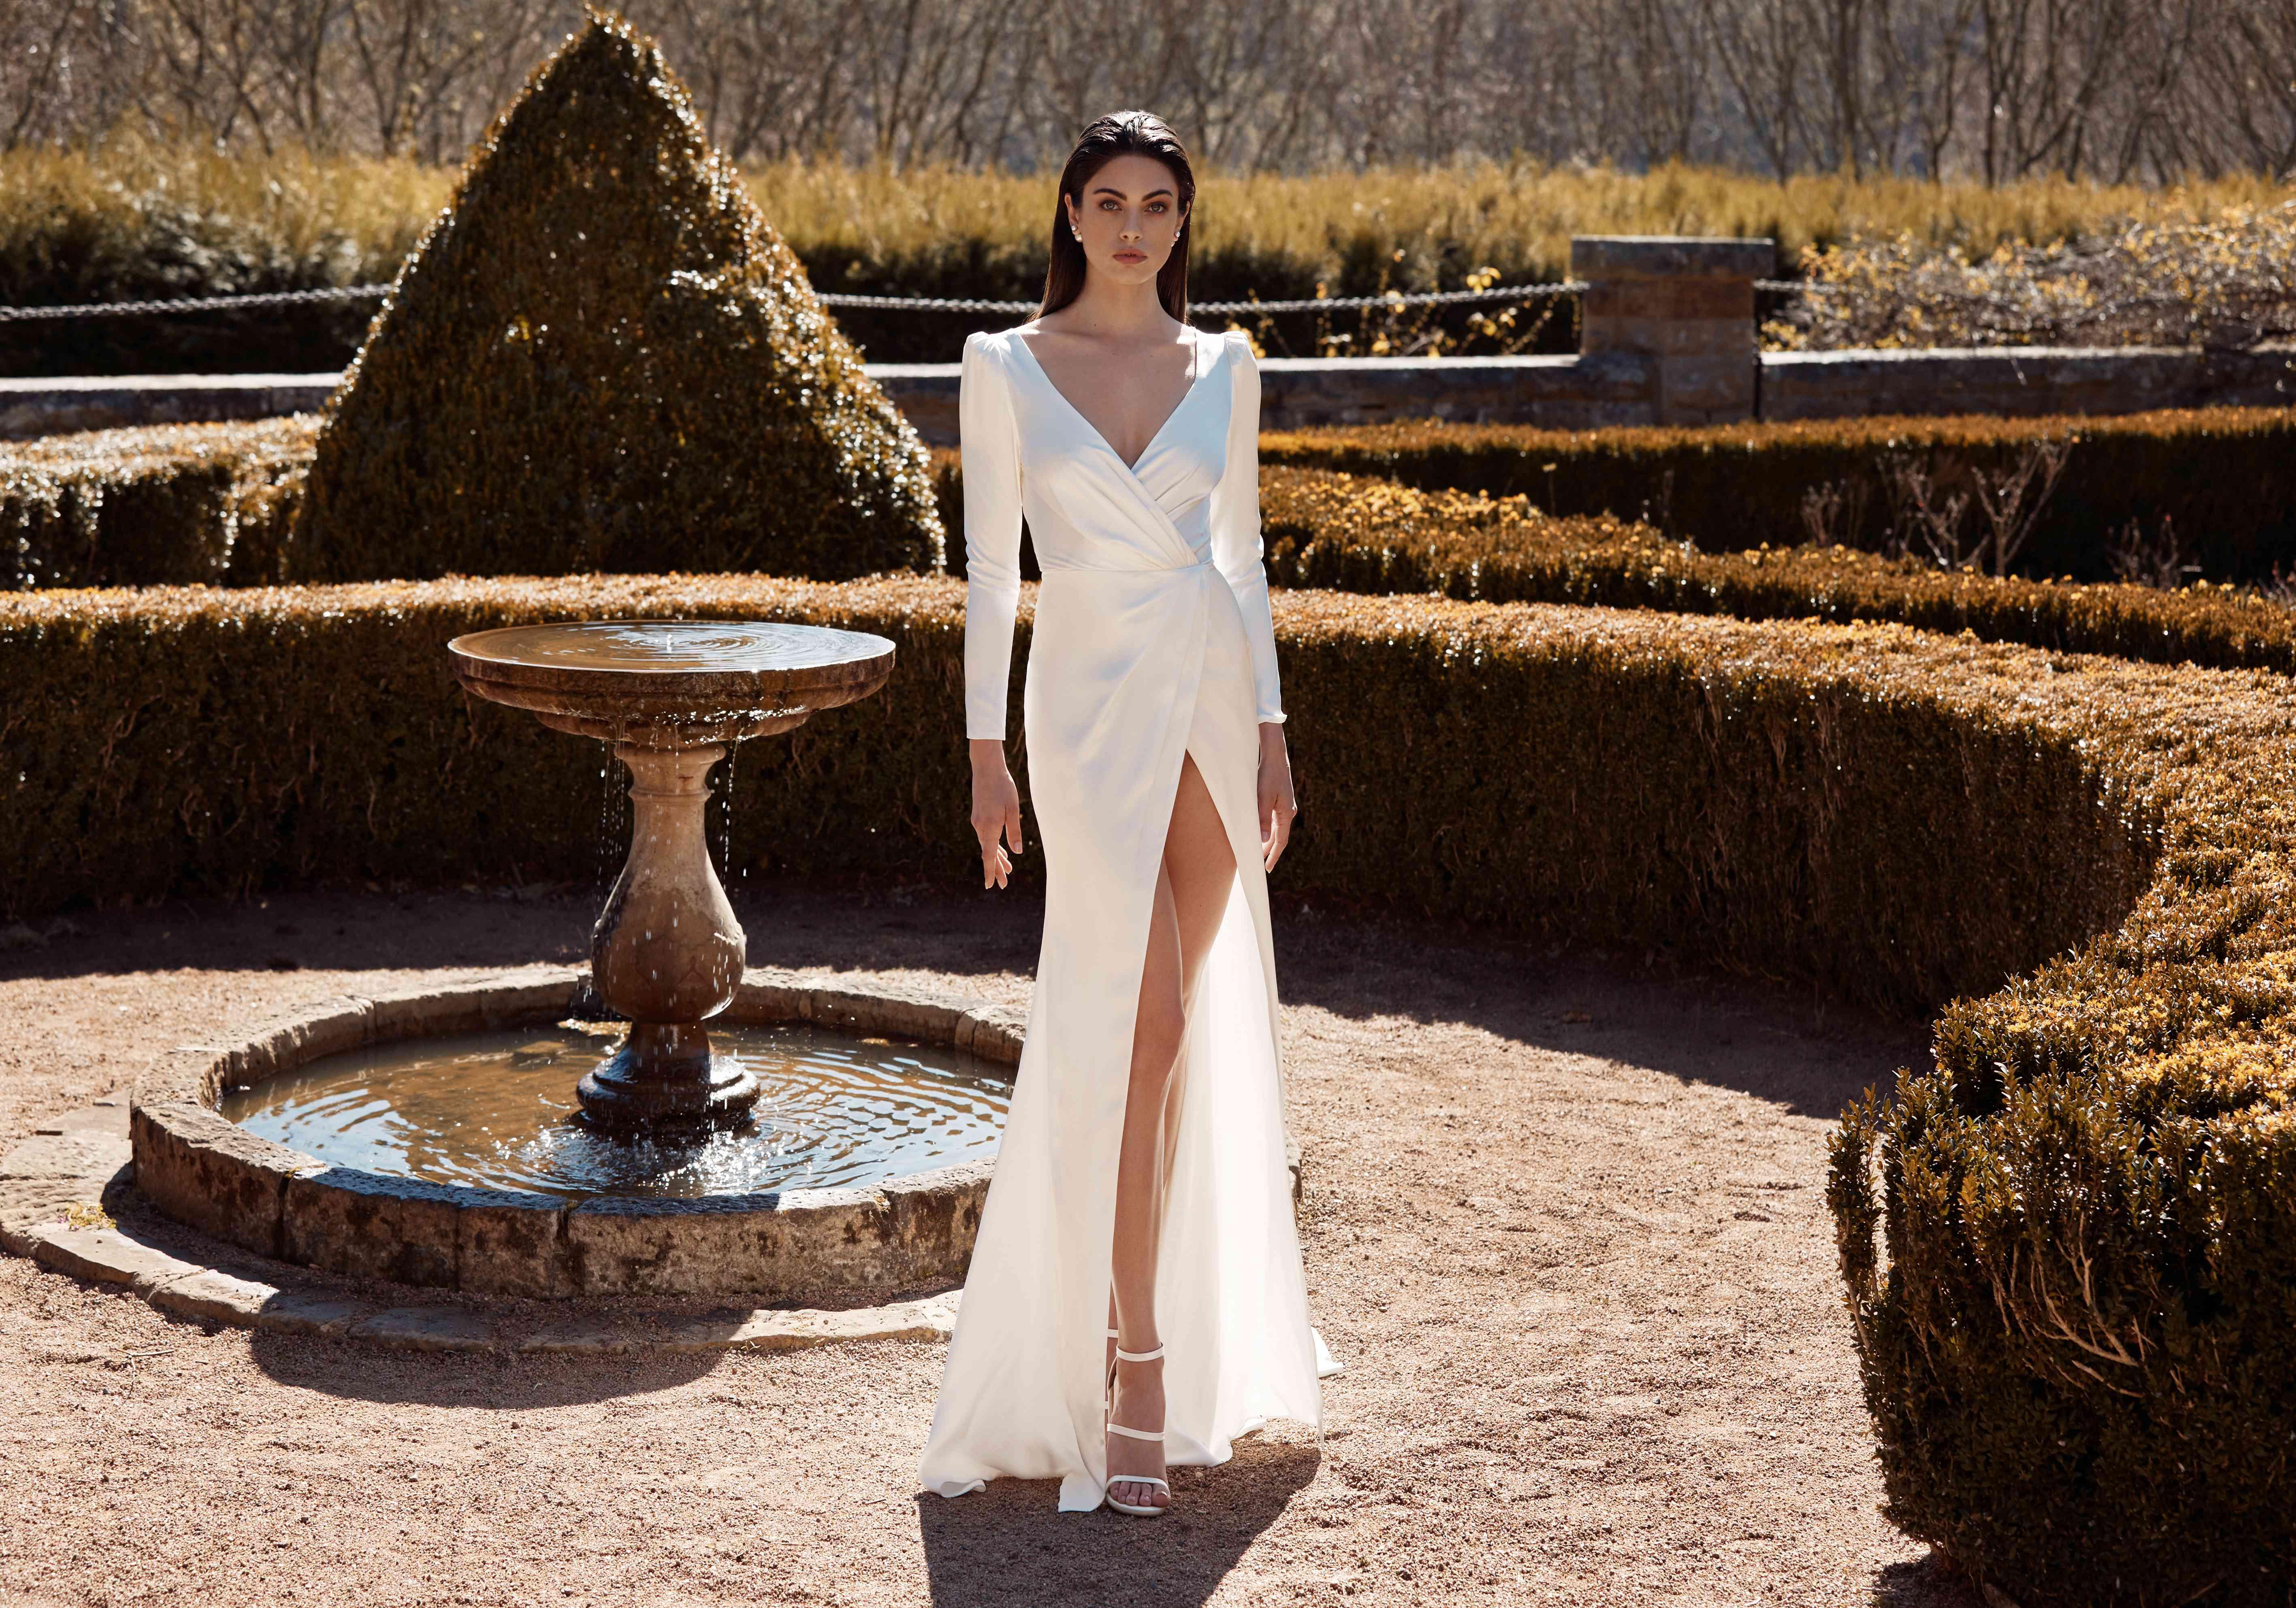 Marcelle wraparound wedding dress